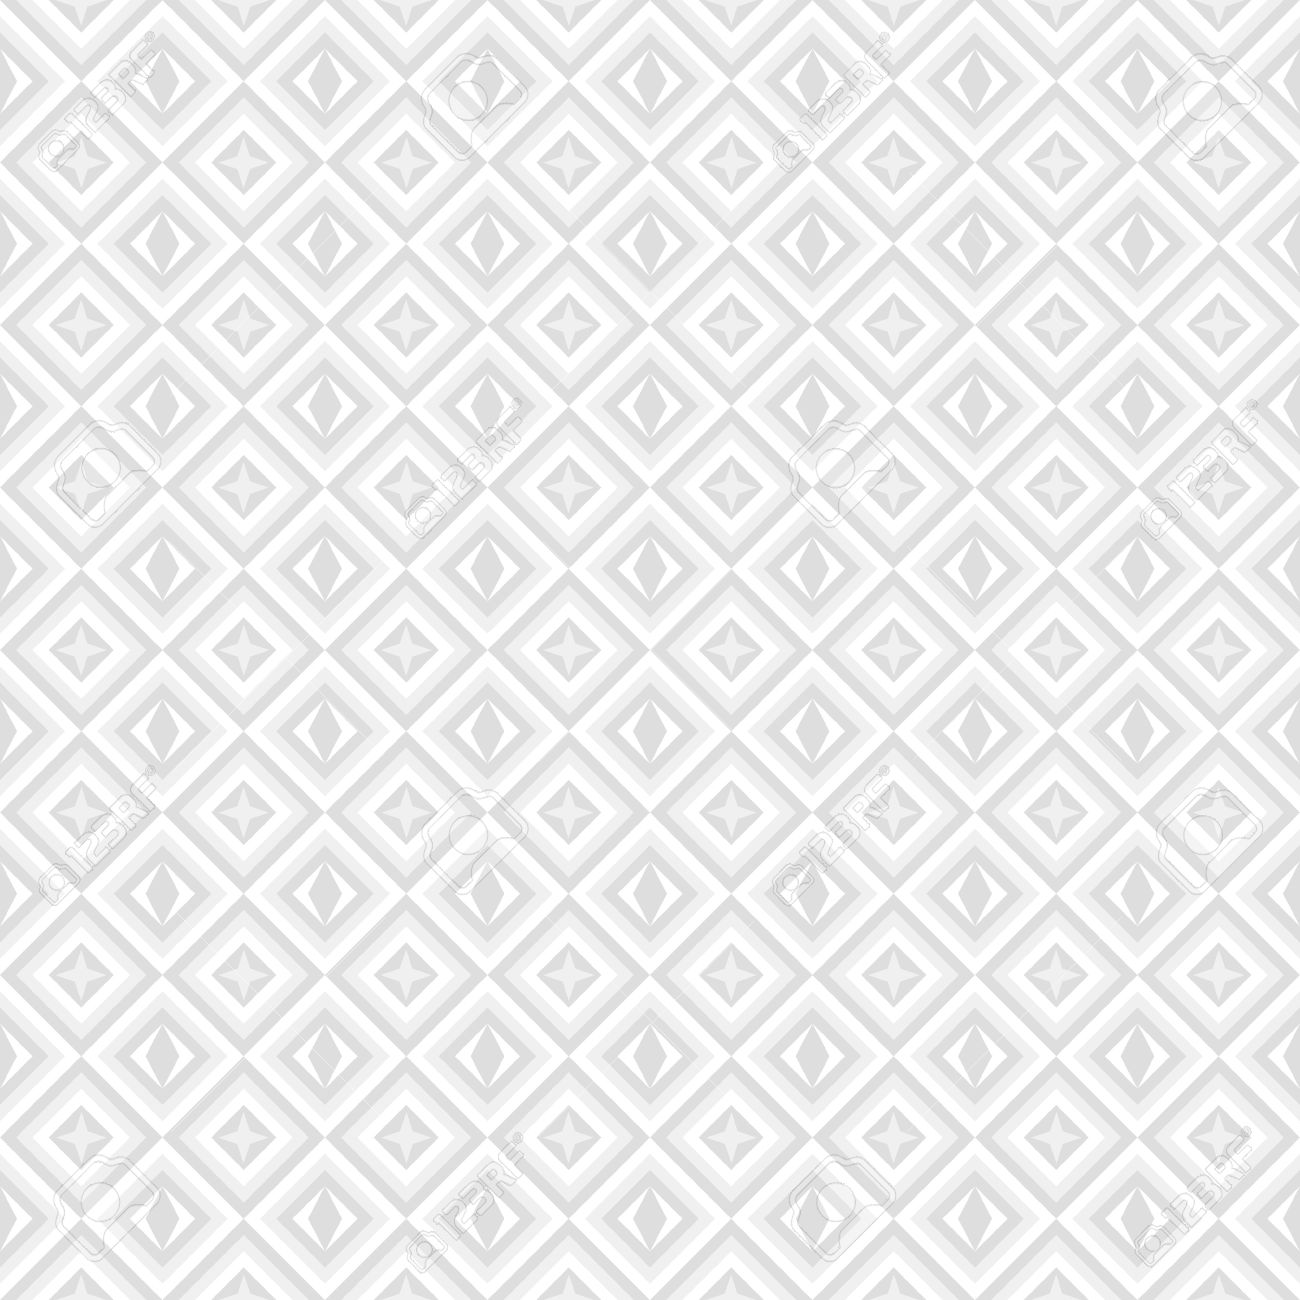 White Pattern Background New Inspiration Design